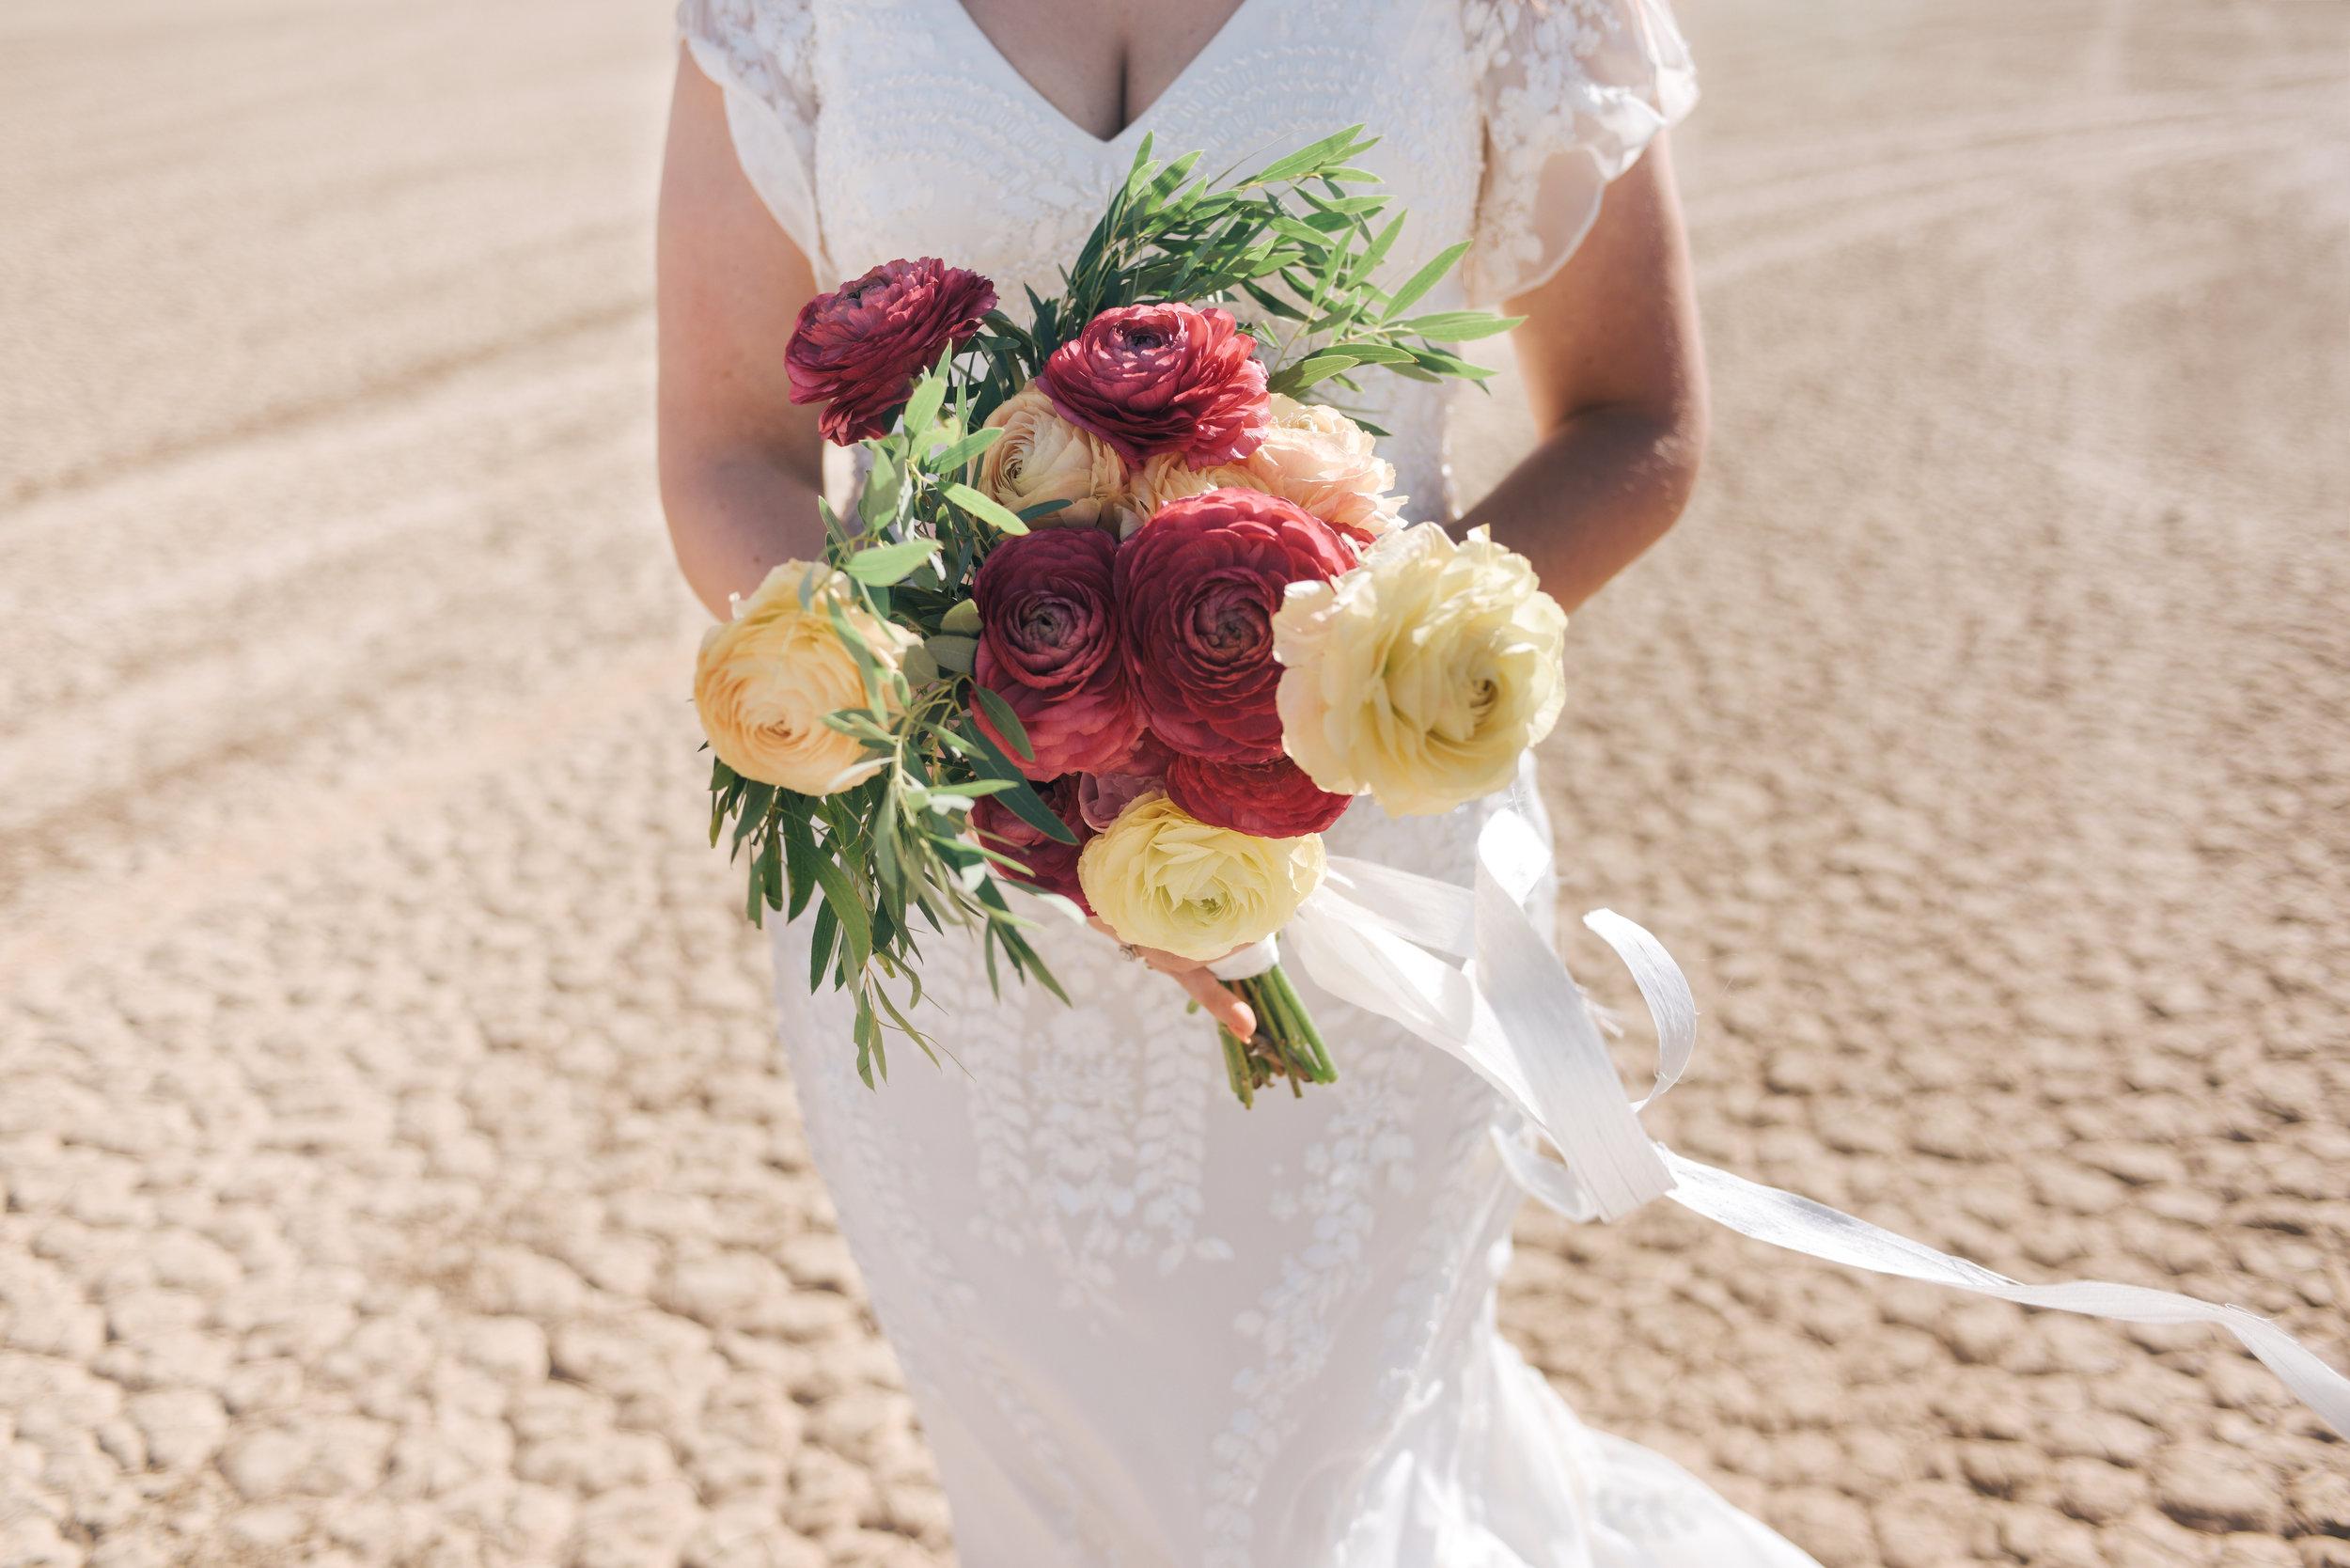 flora pop ceremony, flora pop, bride, las vegas wedding, las vegas elopement, elopement, elope, dry lake bed wedding, lifestyle photography, las vegas, flowers, bridal flowers, wedding dress, wedding, elope